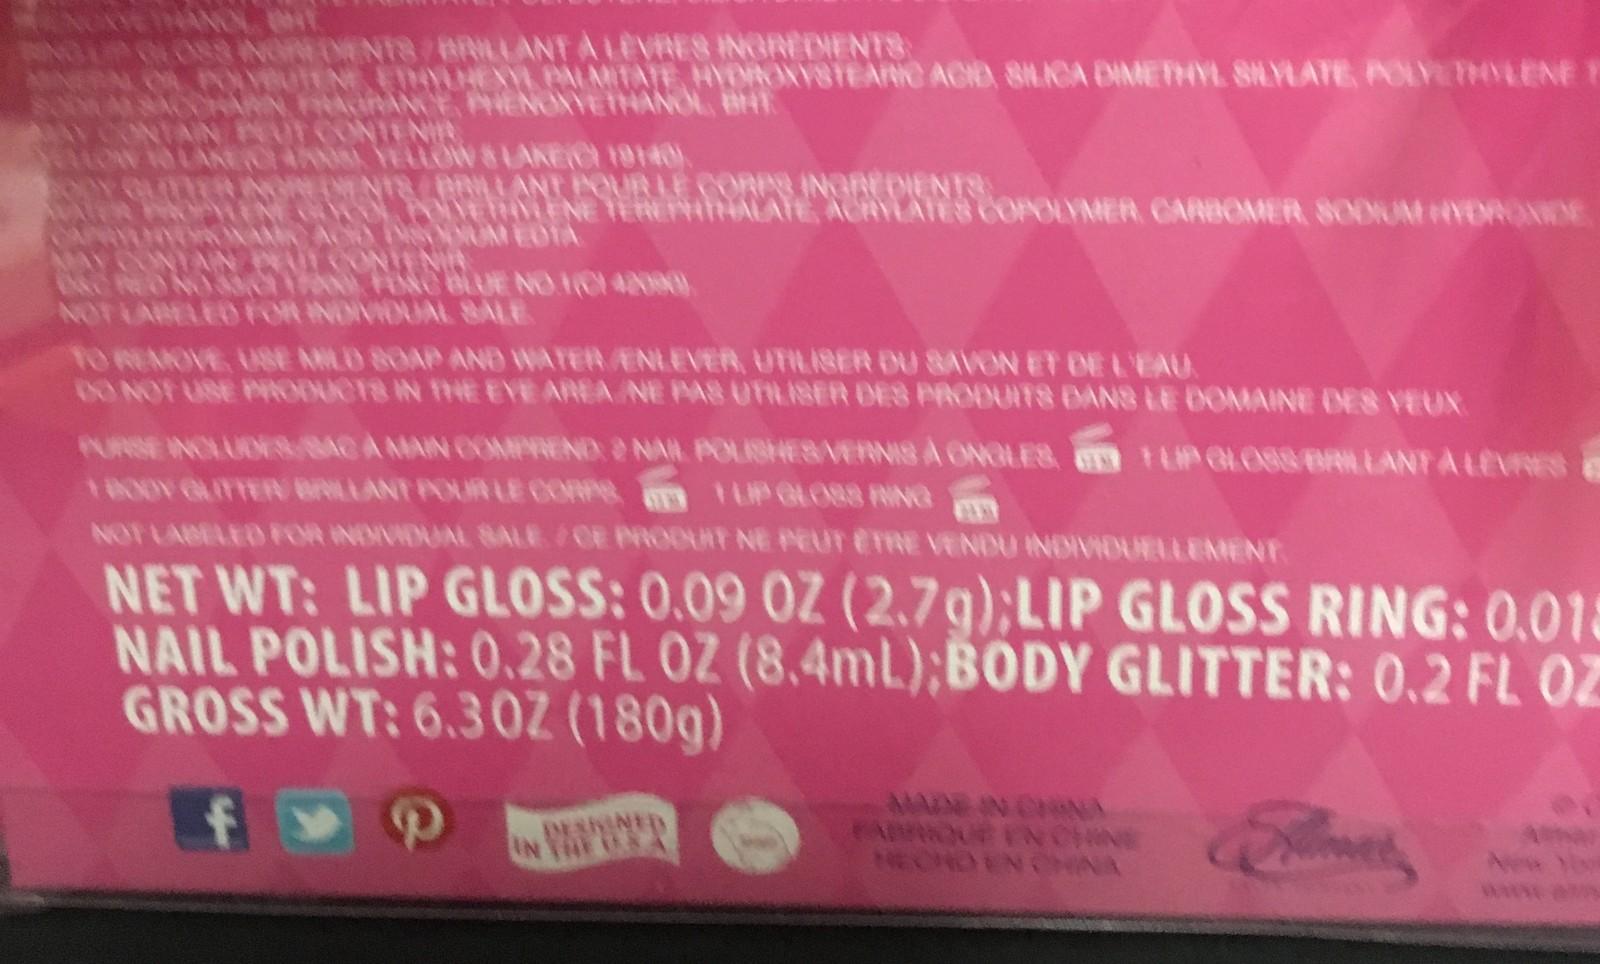 My Princess Academy Cosmetic Purse Ages 5+ Lip Gloss, Polish, Body Glitter